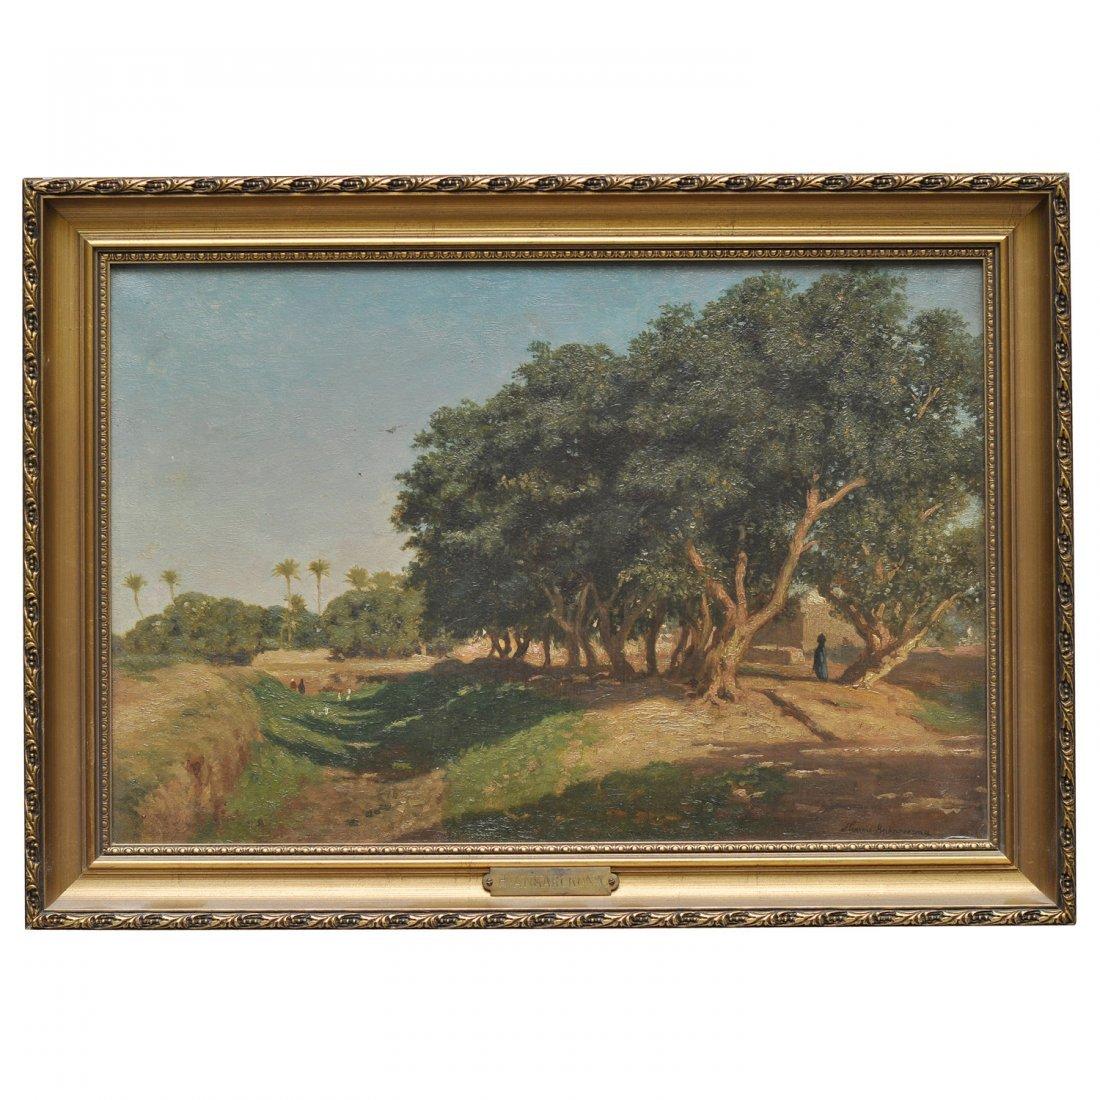 8: HENRIK AUGUST ANKARCRONA (1831-1917), olja på duk